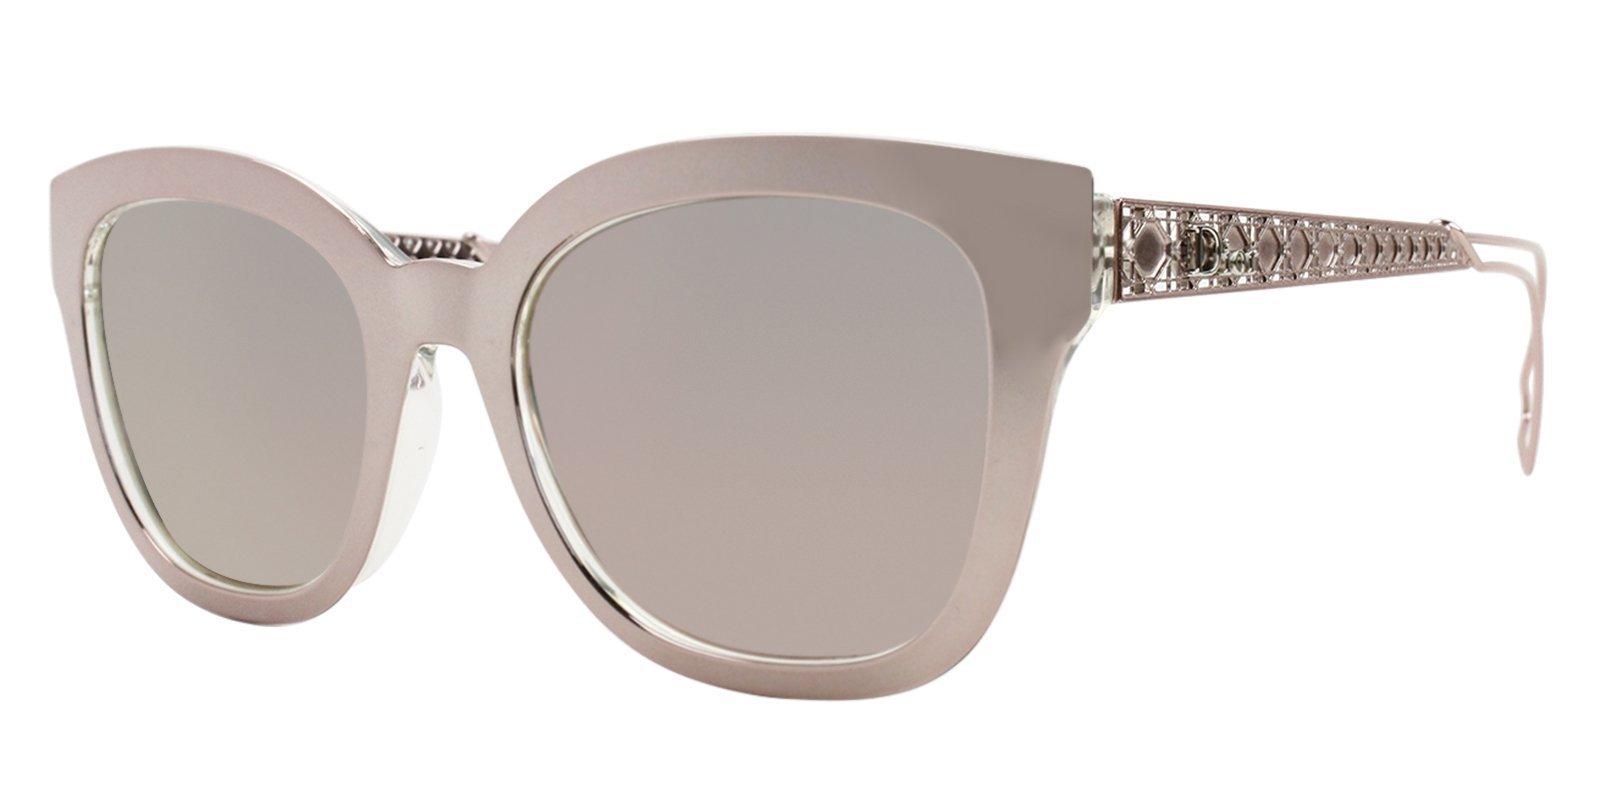 8088d4f2654 Dior - Diorama1 Pink - Pink sunglasses